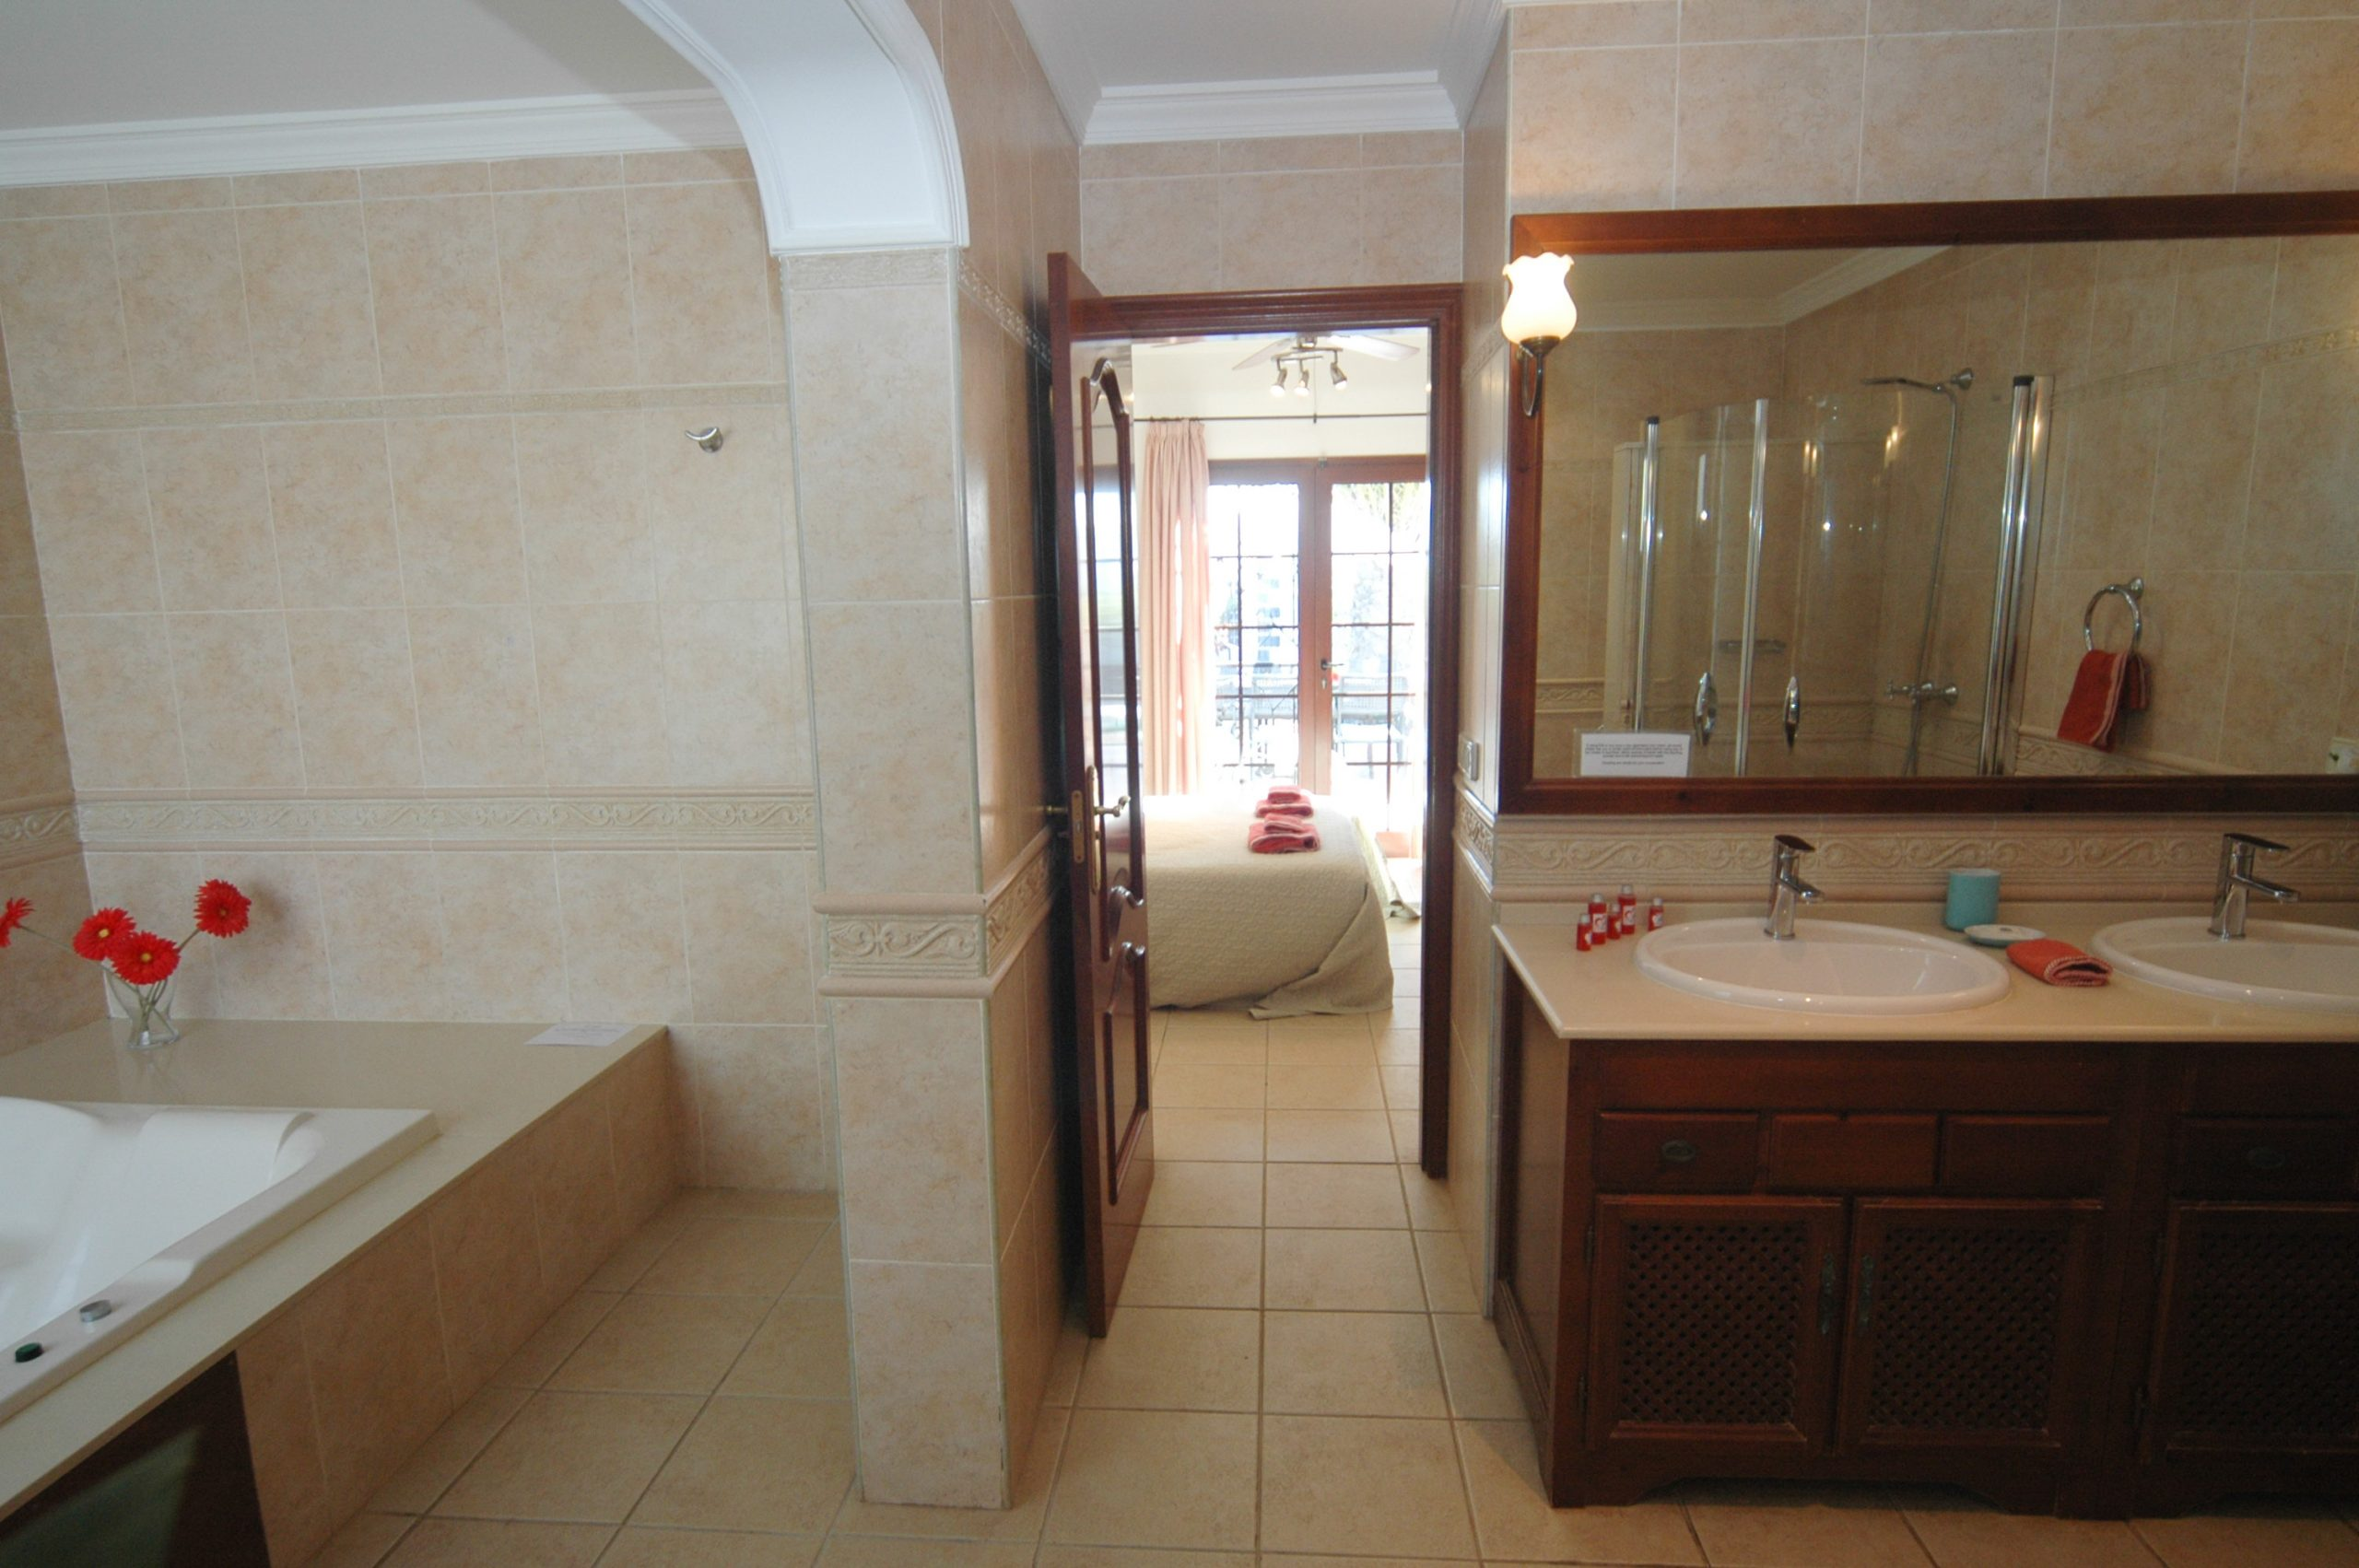 LVC200828 Ensuite full bathroom